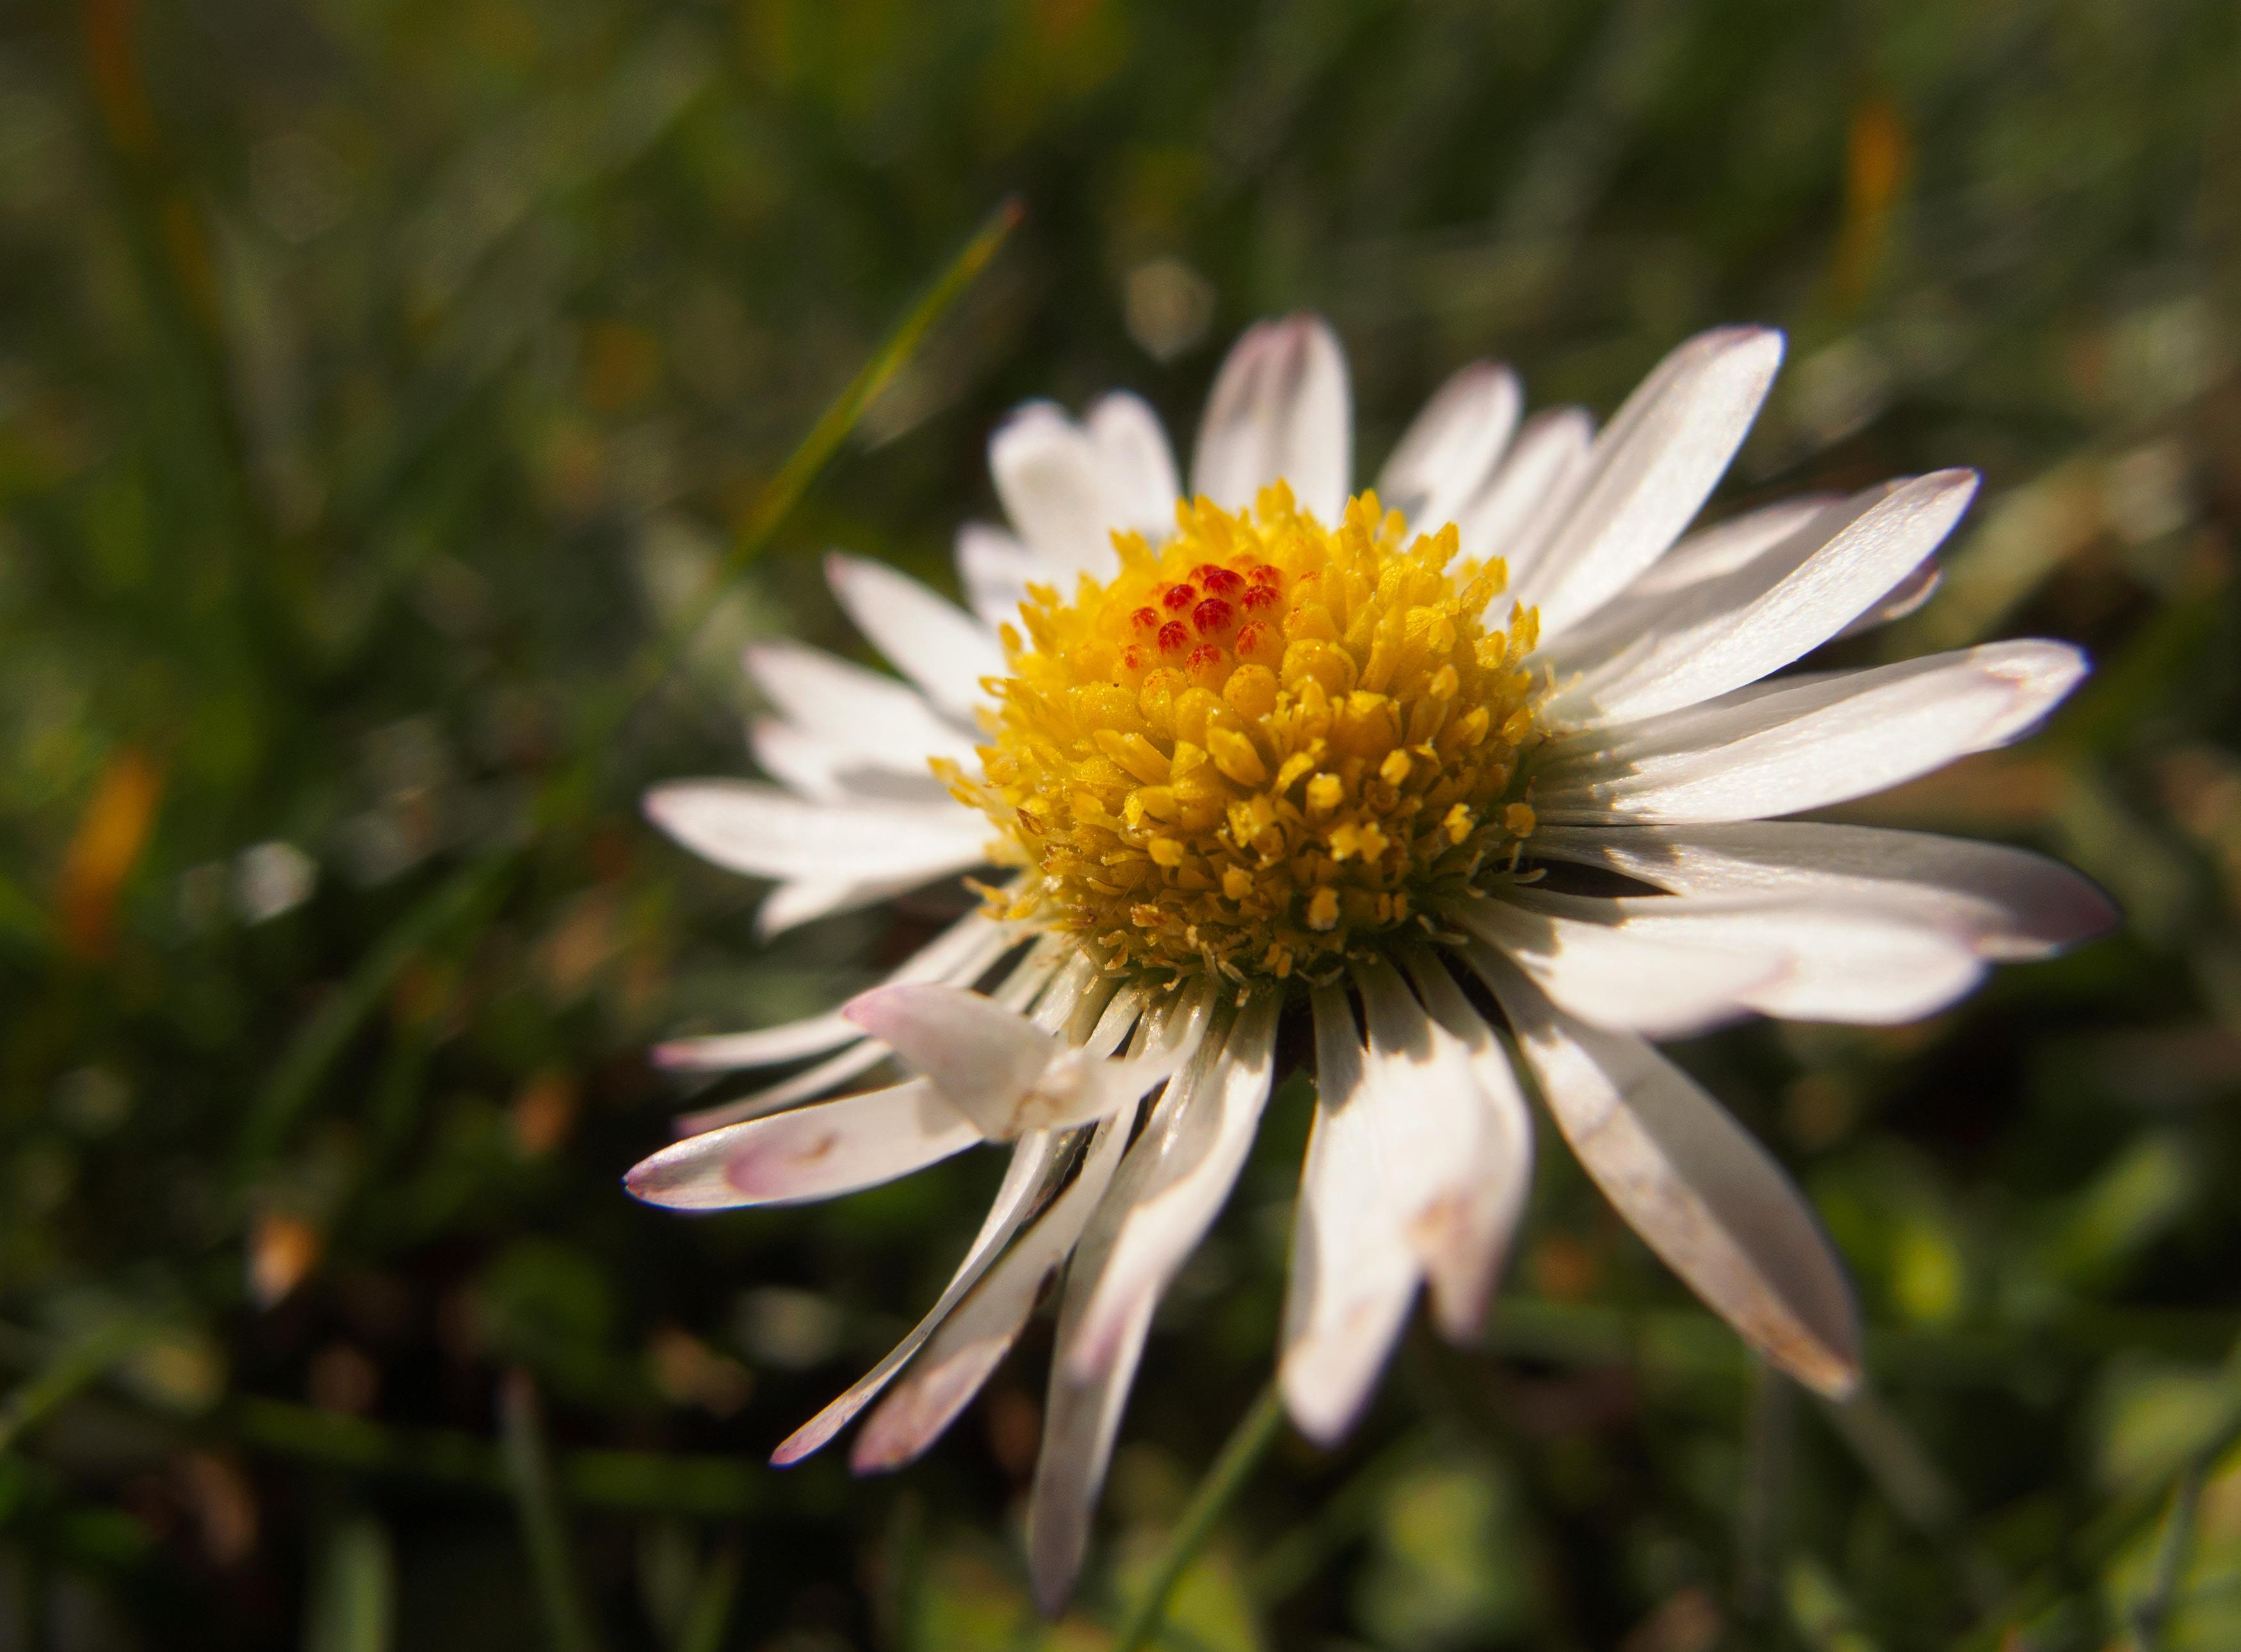 free image: daisy flower | libreshot public domain photos